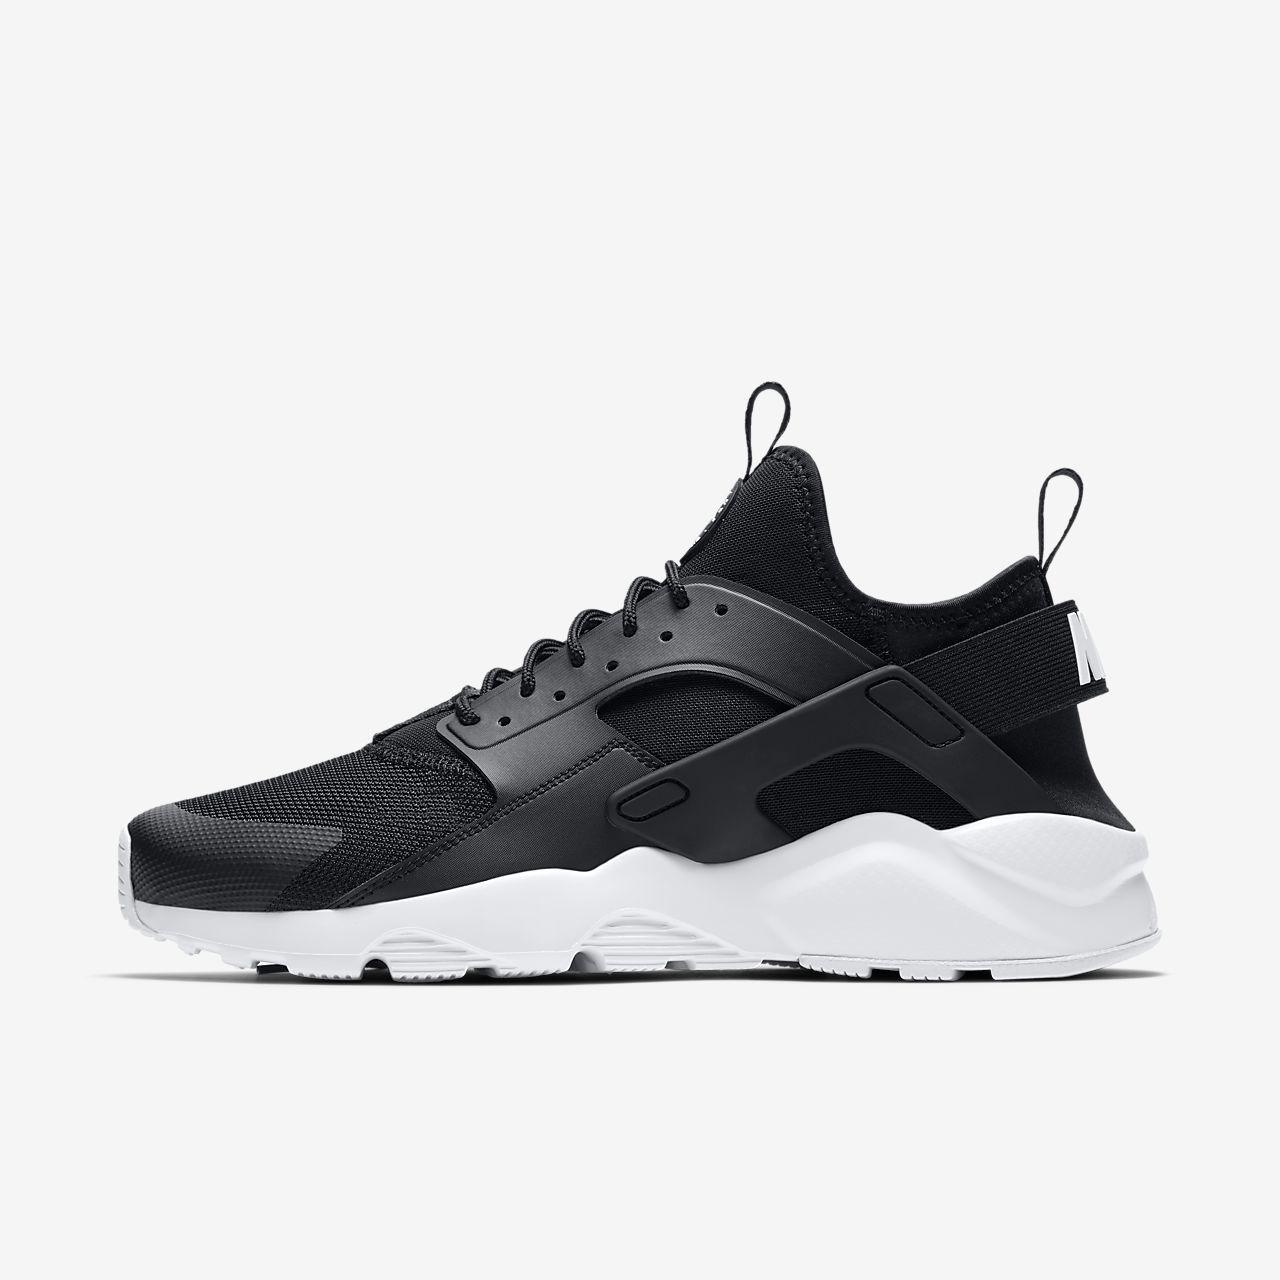 0d5a523c3c1e Nike Air Huarache Ultra-sko til mænd. Nike.com DK